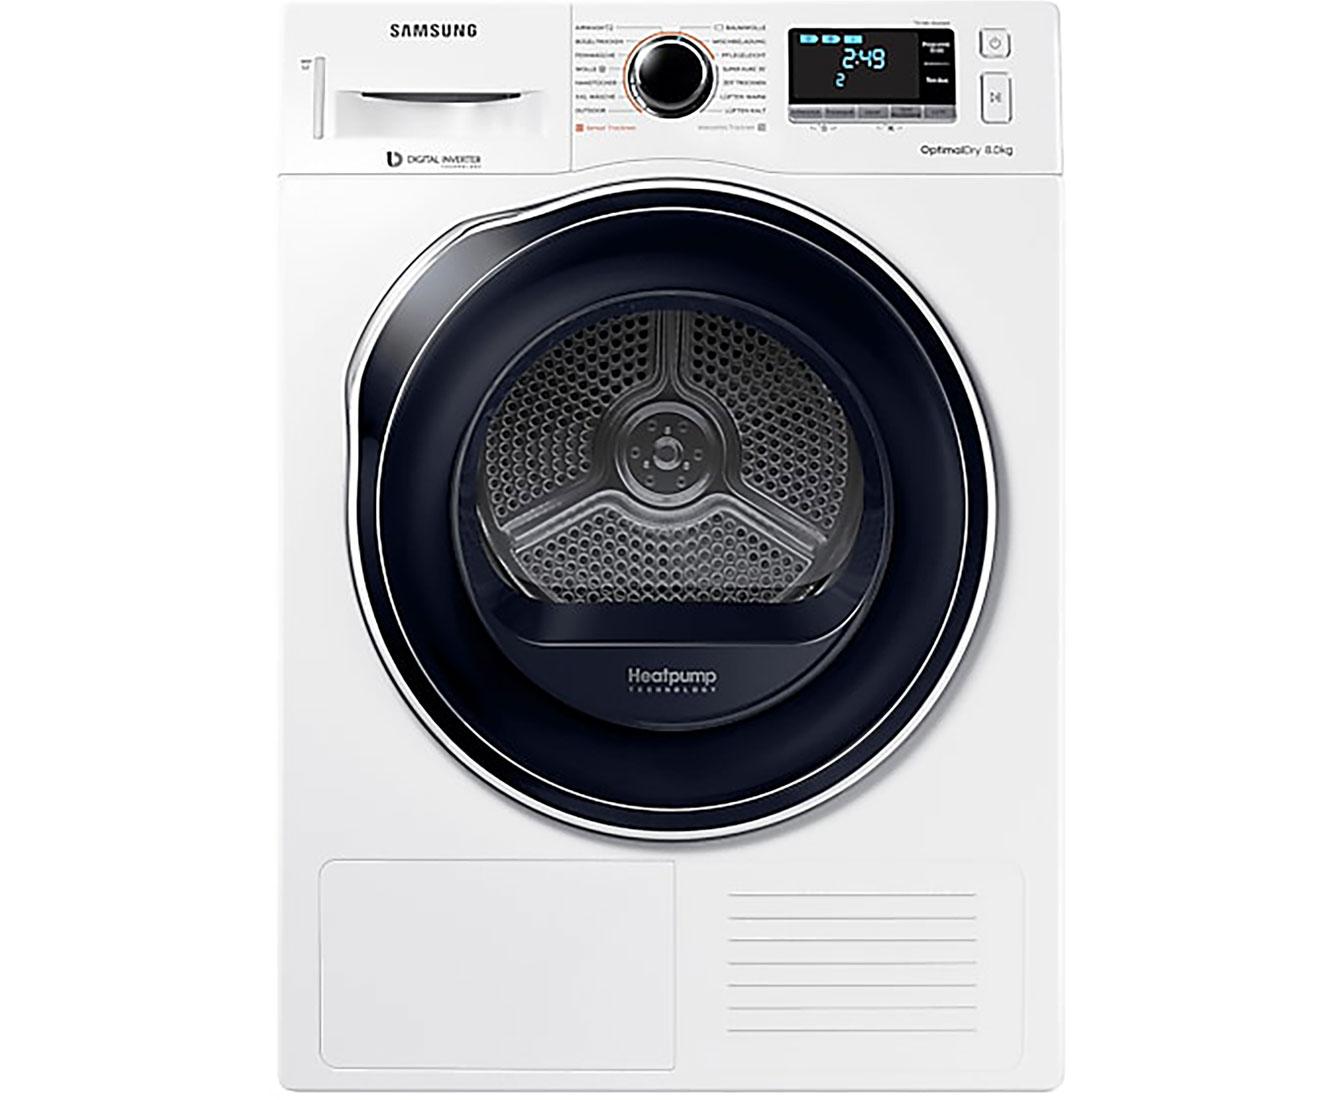 Samsung DV81M6210CW/EG Wärmepumpentrockner - Weiß | Bad > Waschmaschinen und Trockner > Wärmepumpentrockner | Weiß | Samsung